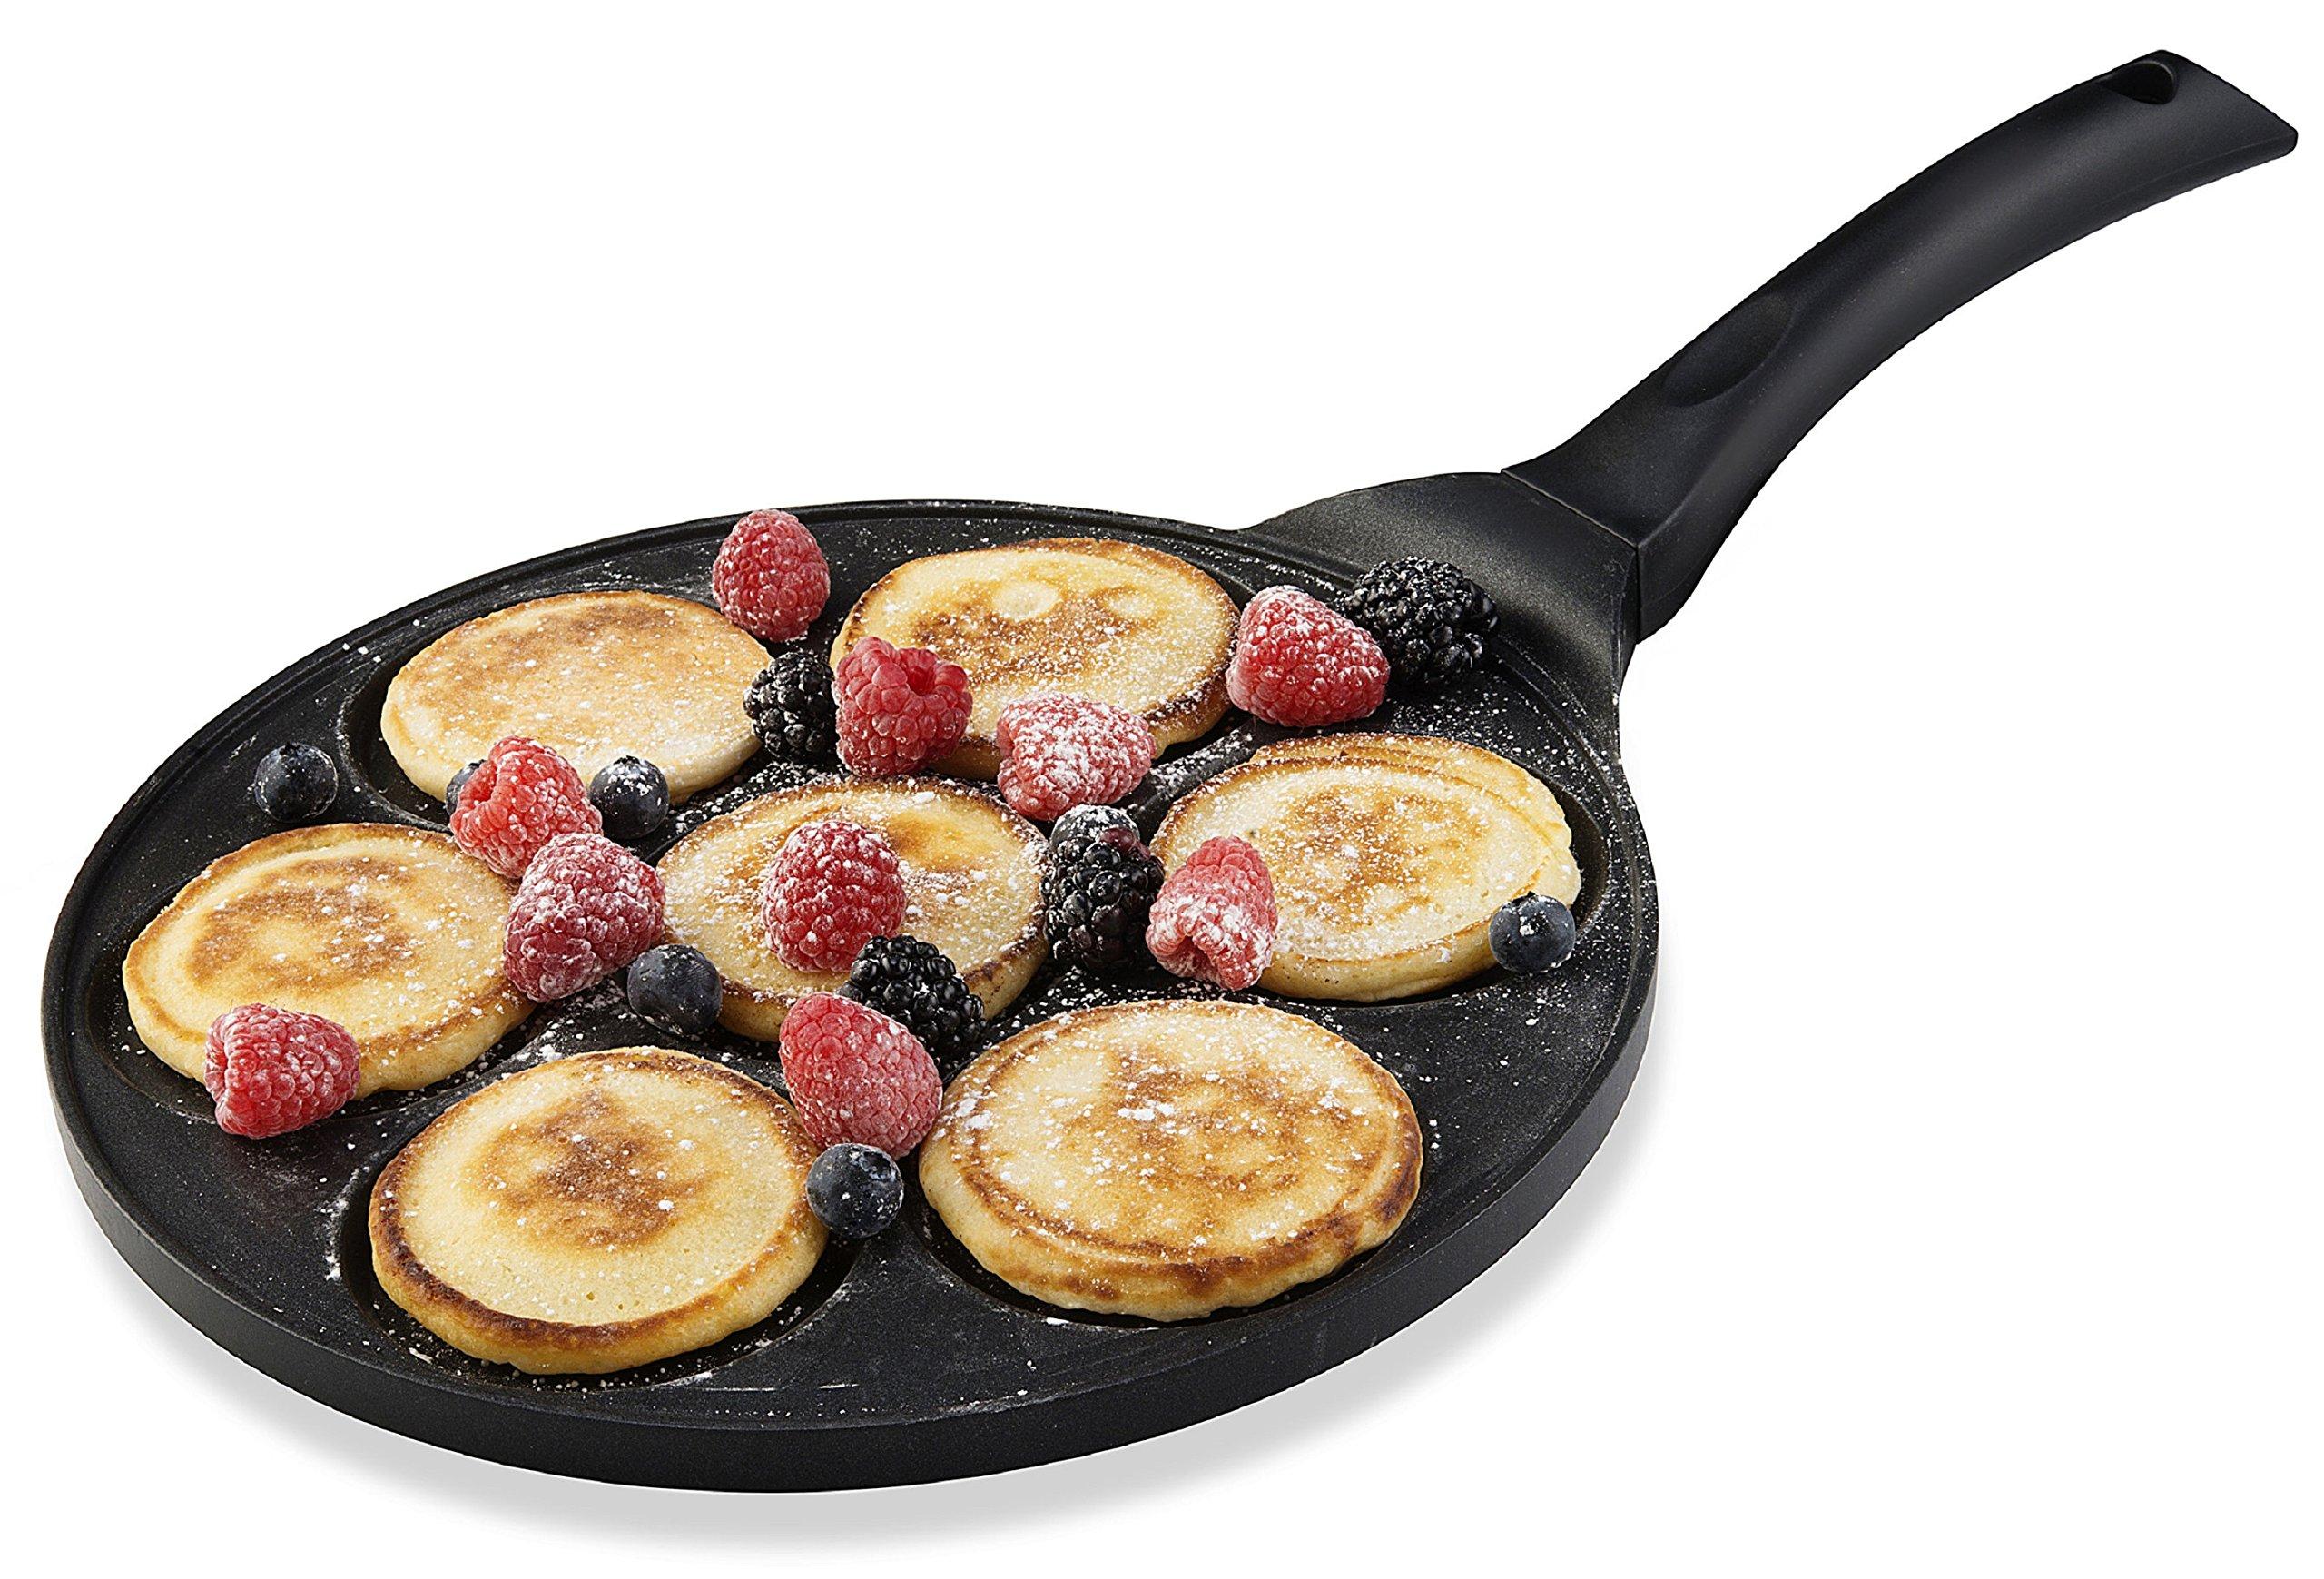 Gourmia GPA9510 Blini Pan Nonstick Silver Dollar Pancake Pan With 7-Mold Design 100% PFOA free non-stick coating